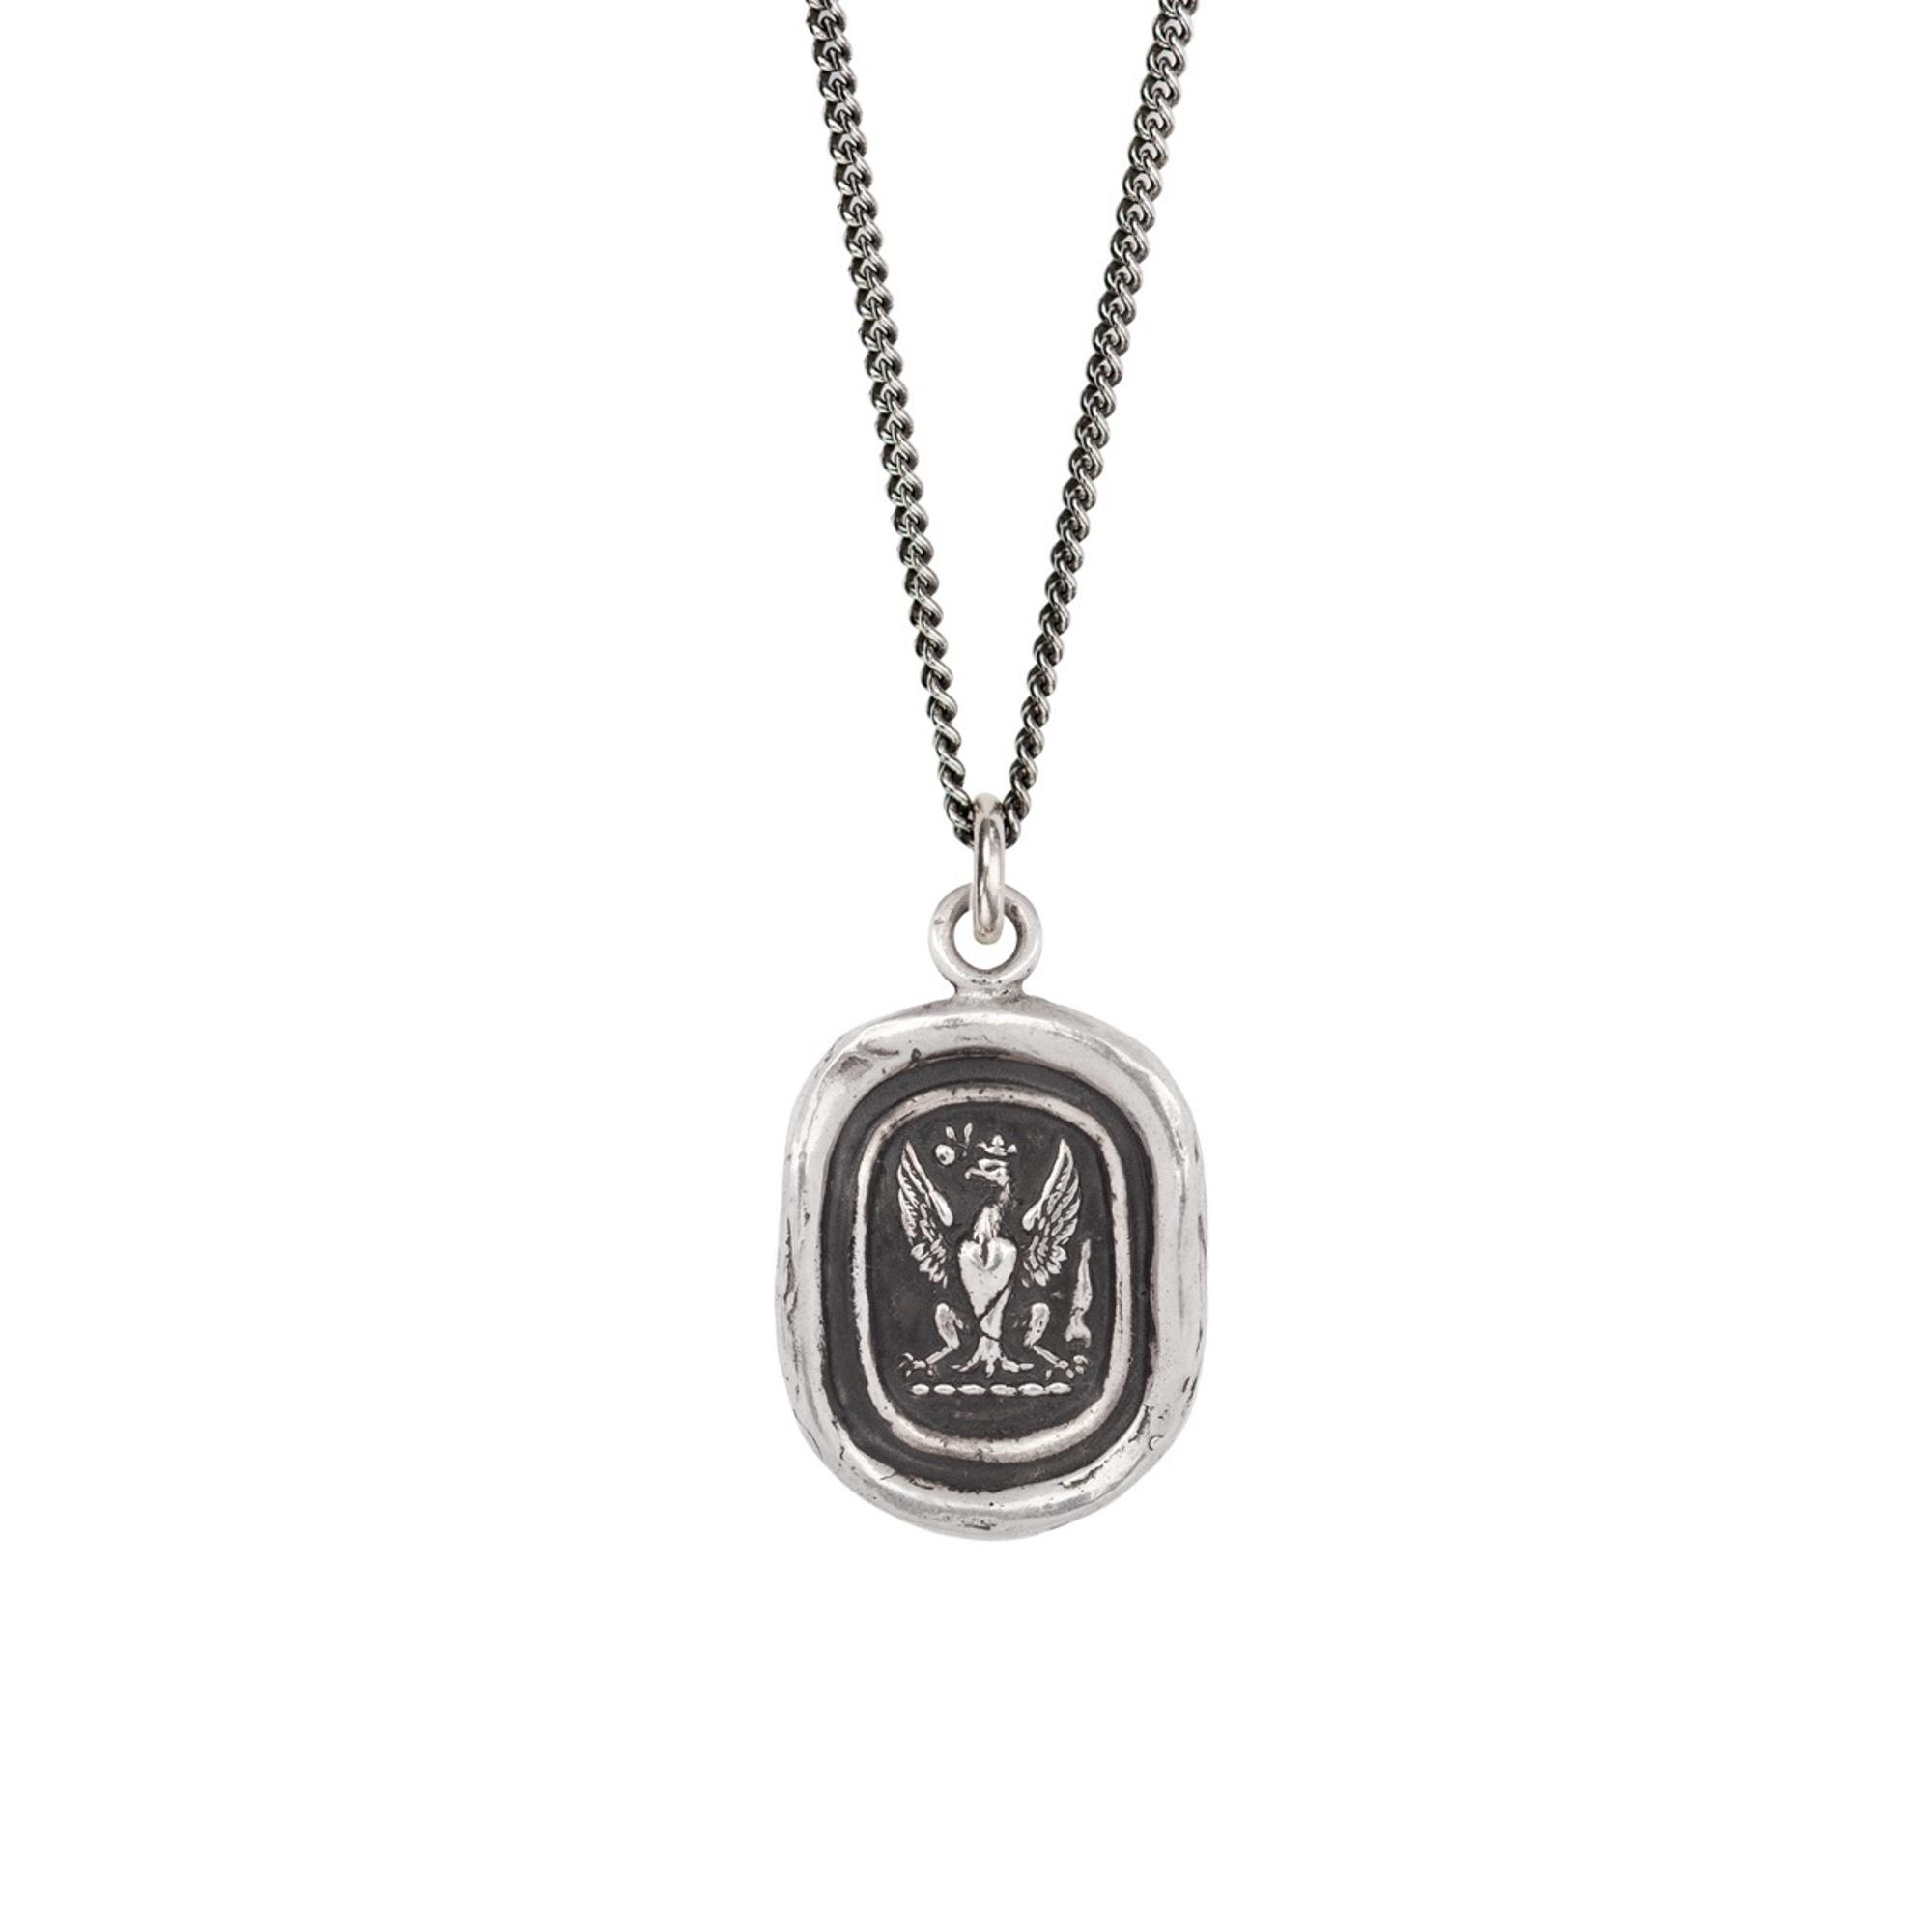 Pyrrha Sterling Silver Follow Your Dreams Talisman Necklace